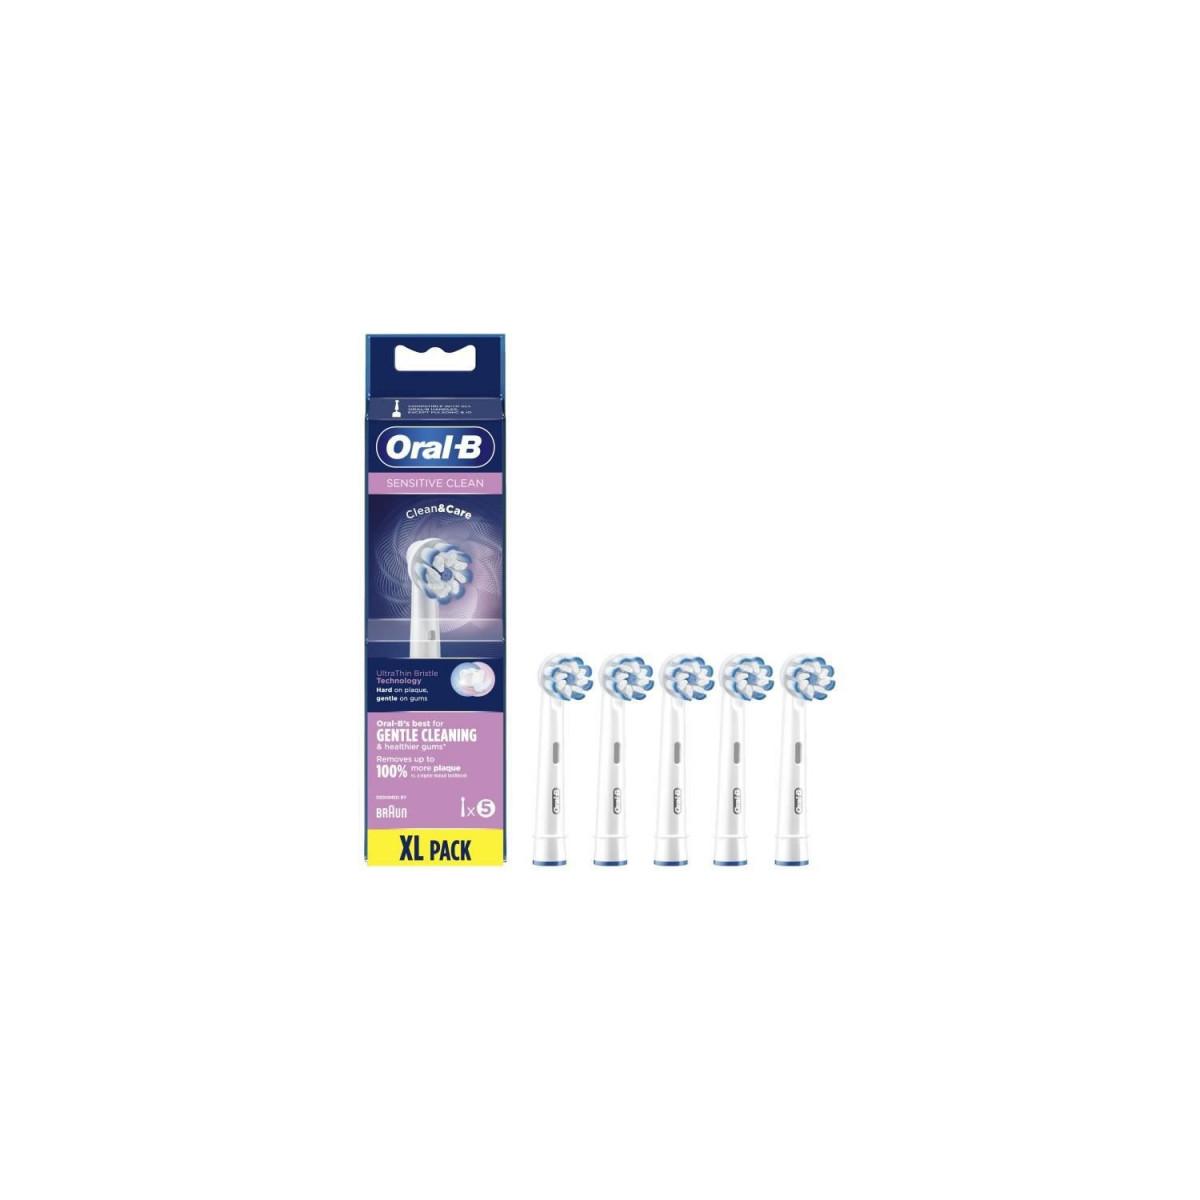 Oral-B Oral-B Sensitive Clean Brossette, 5